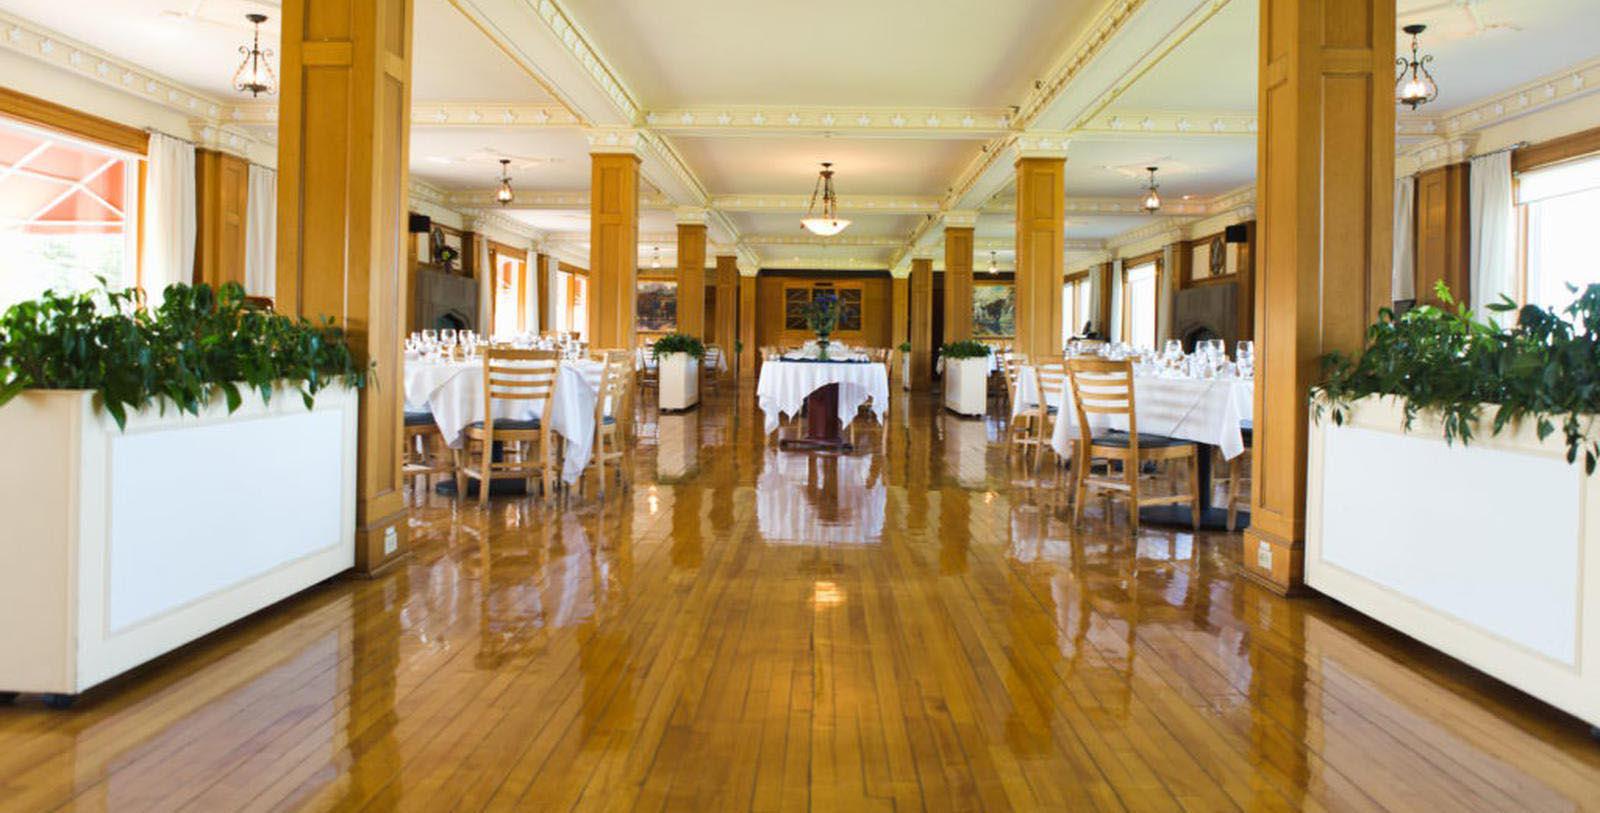 Image of Dining Area Keltic Lodge Resort and Spa, 1940, Member of Historic Hotels Worldwide, in Ingonish Beach, Nova Scotia, Taste